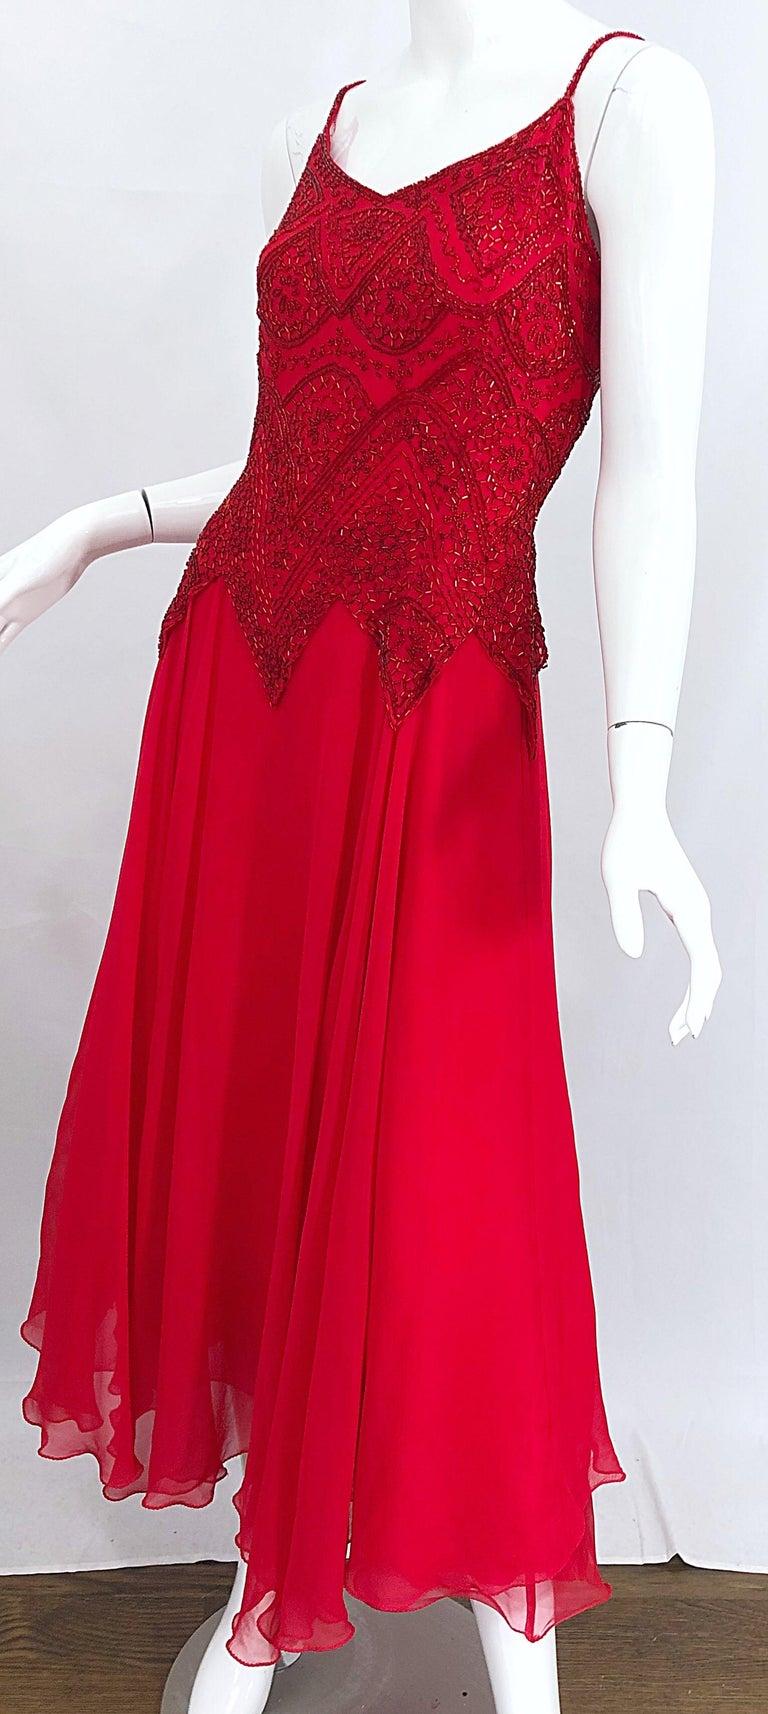 1970s Oleg Cassini Size 10 / 12 Red Silk Chiffon Beaded Handkerchief Midi Dress For Sale 3